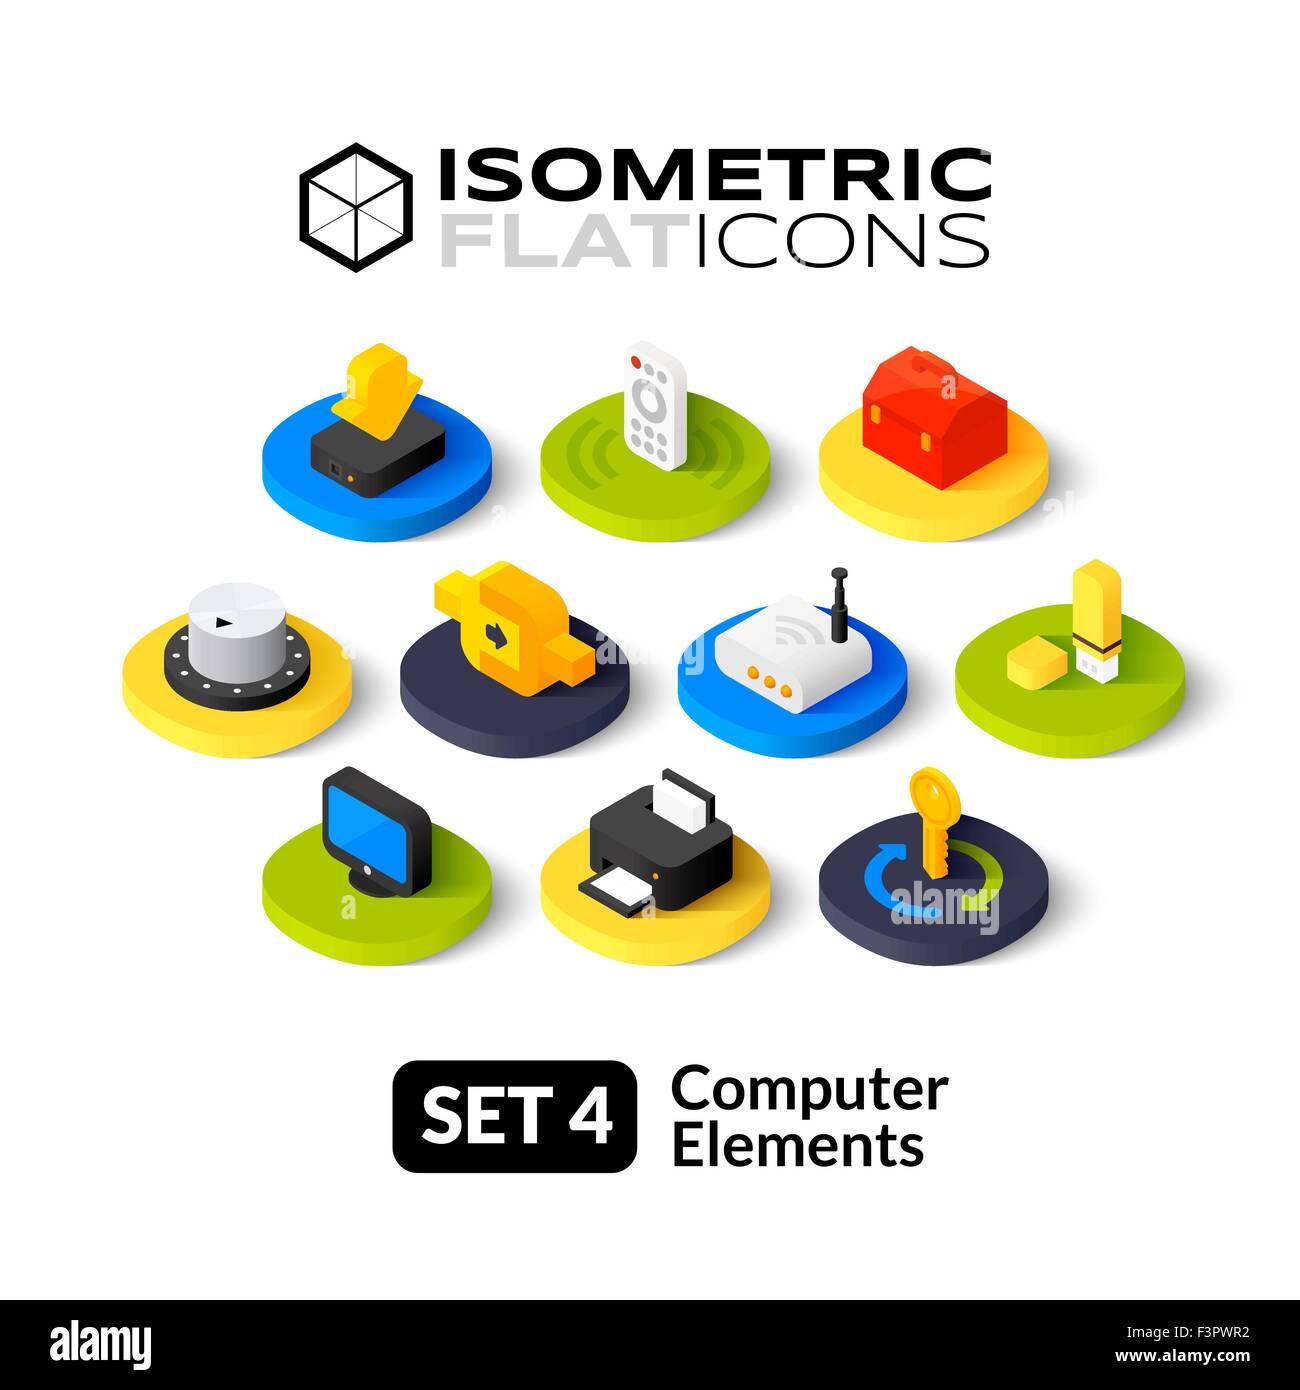 Isometric flat icons set 4 Stock Vector